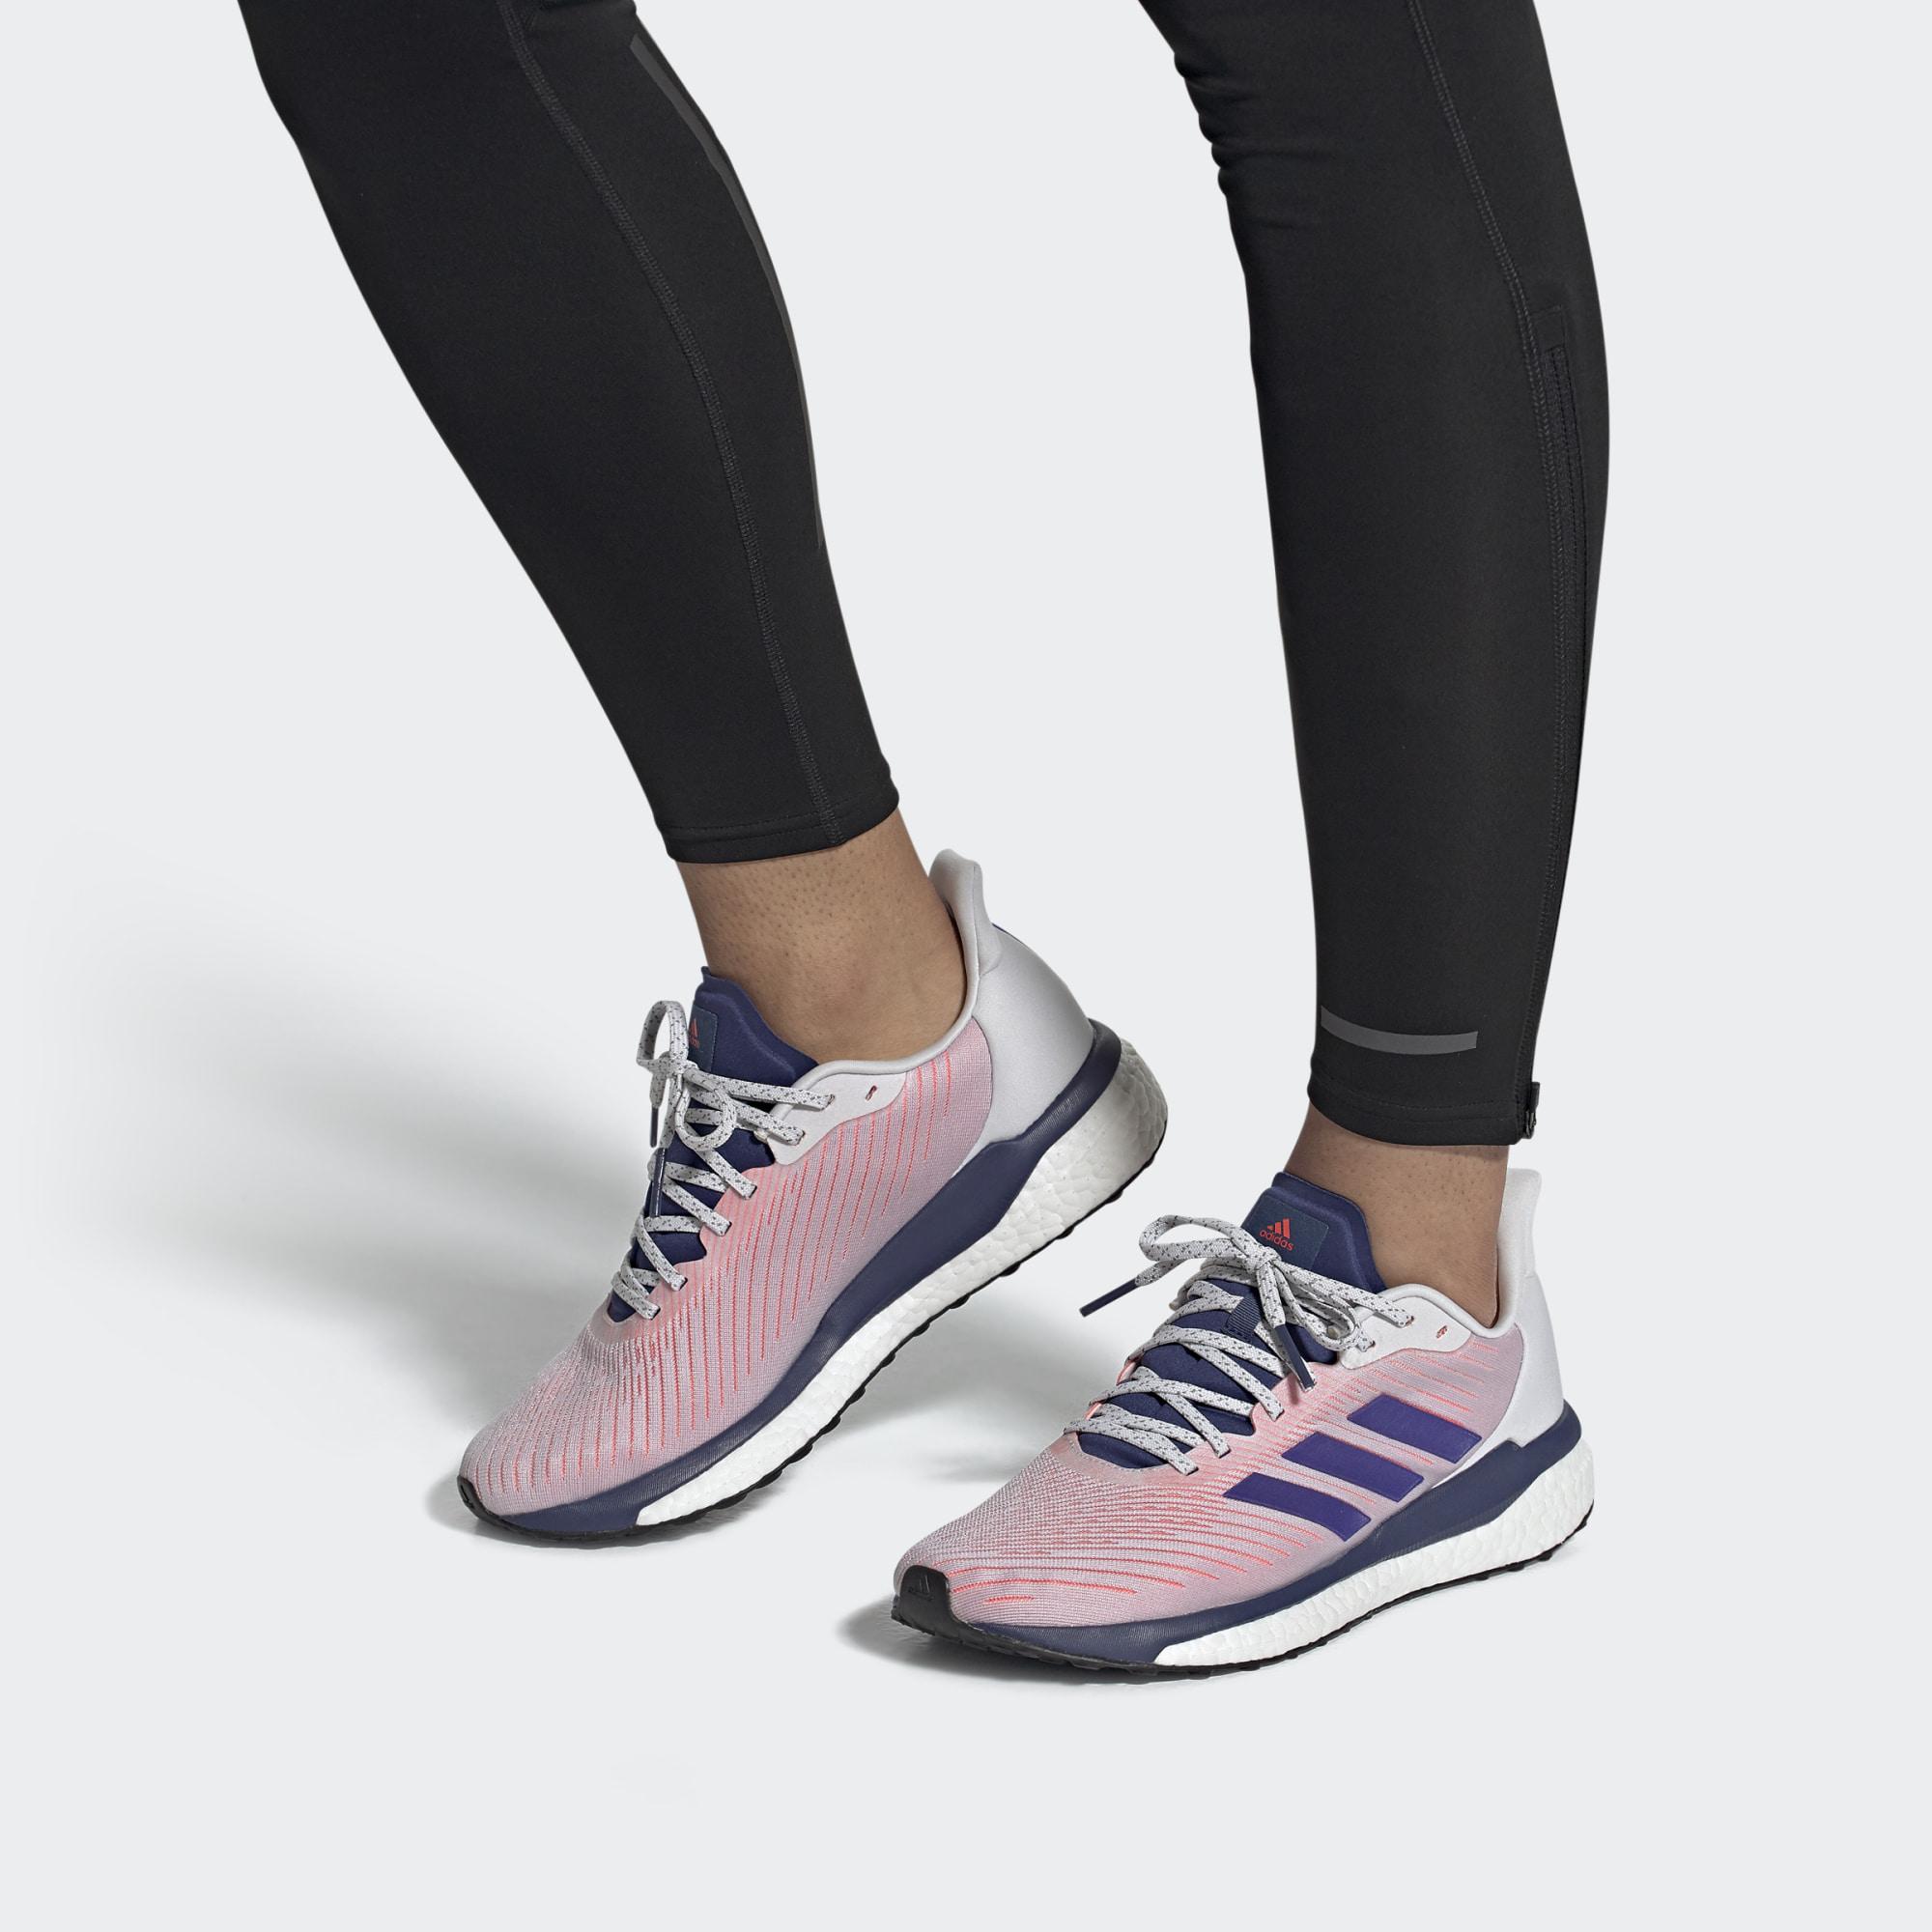 Adidas SOLARDRIVE a 47,98 euros